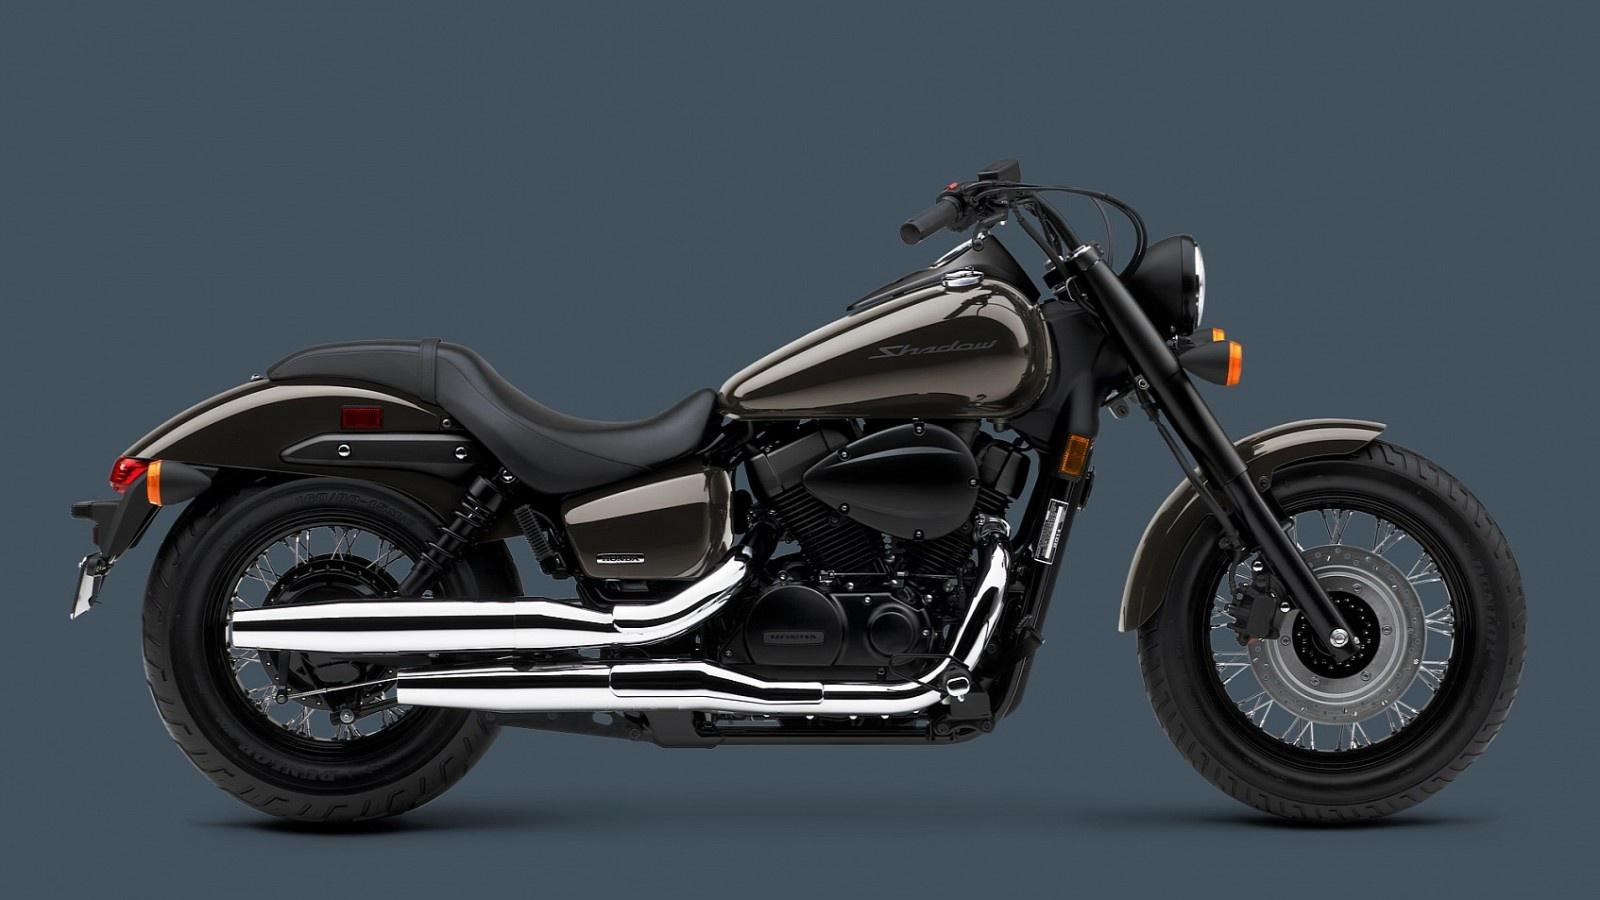 Honda Shadow Black Spirit Phantom 750 Wroc Awski